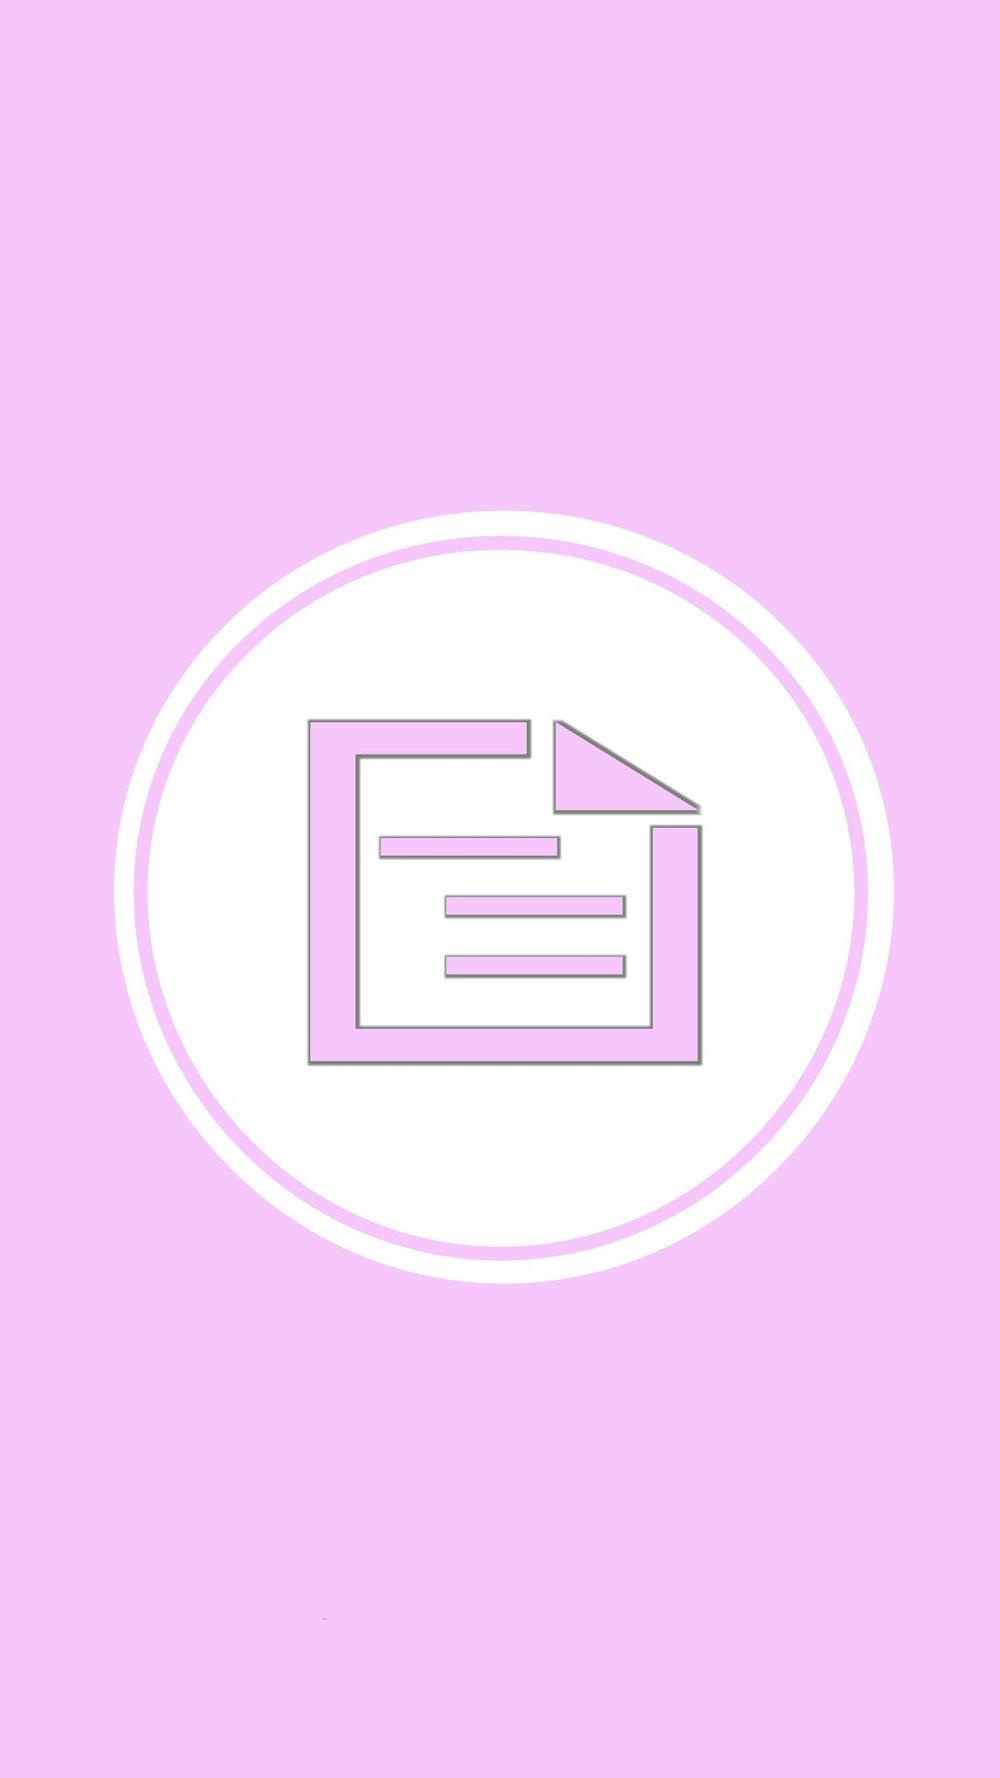 Instagram-cover-blogentry-pink-lotnotes.com.jpg